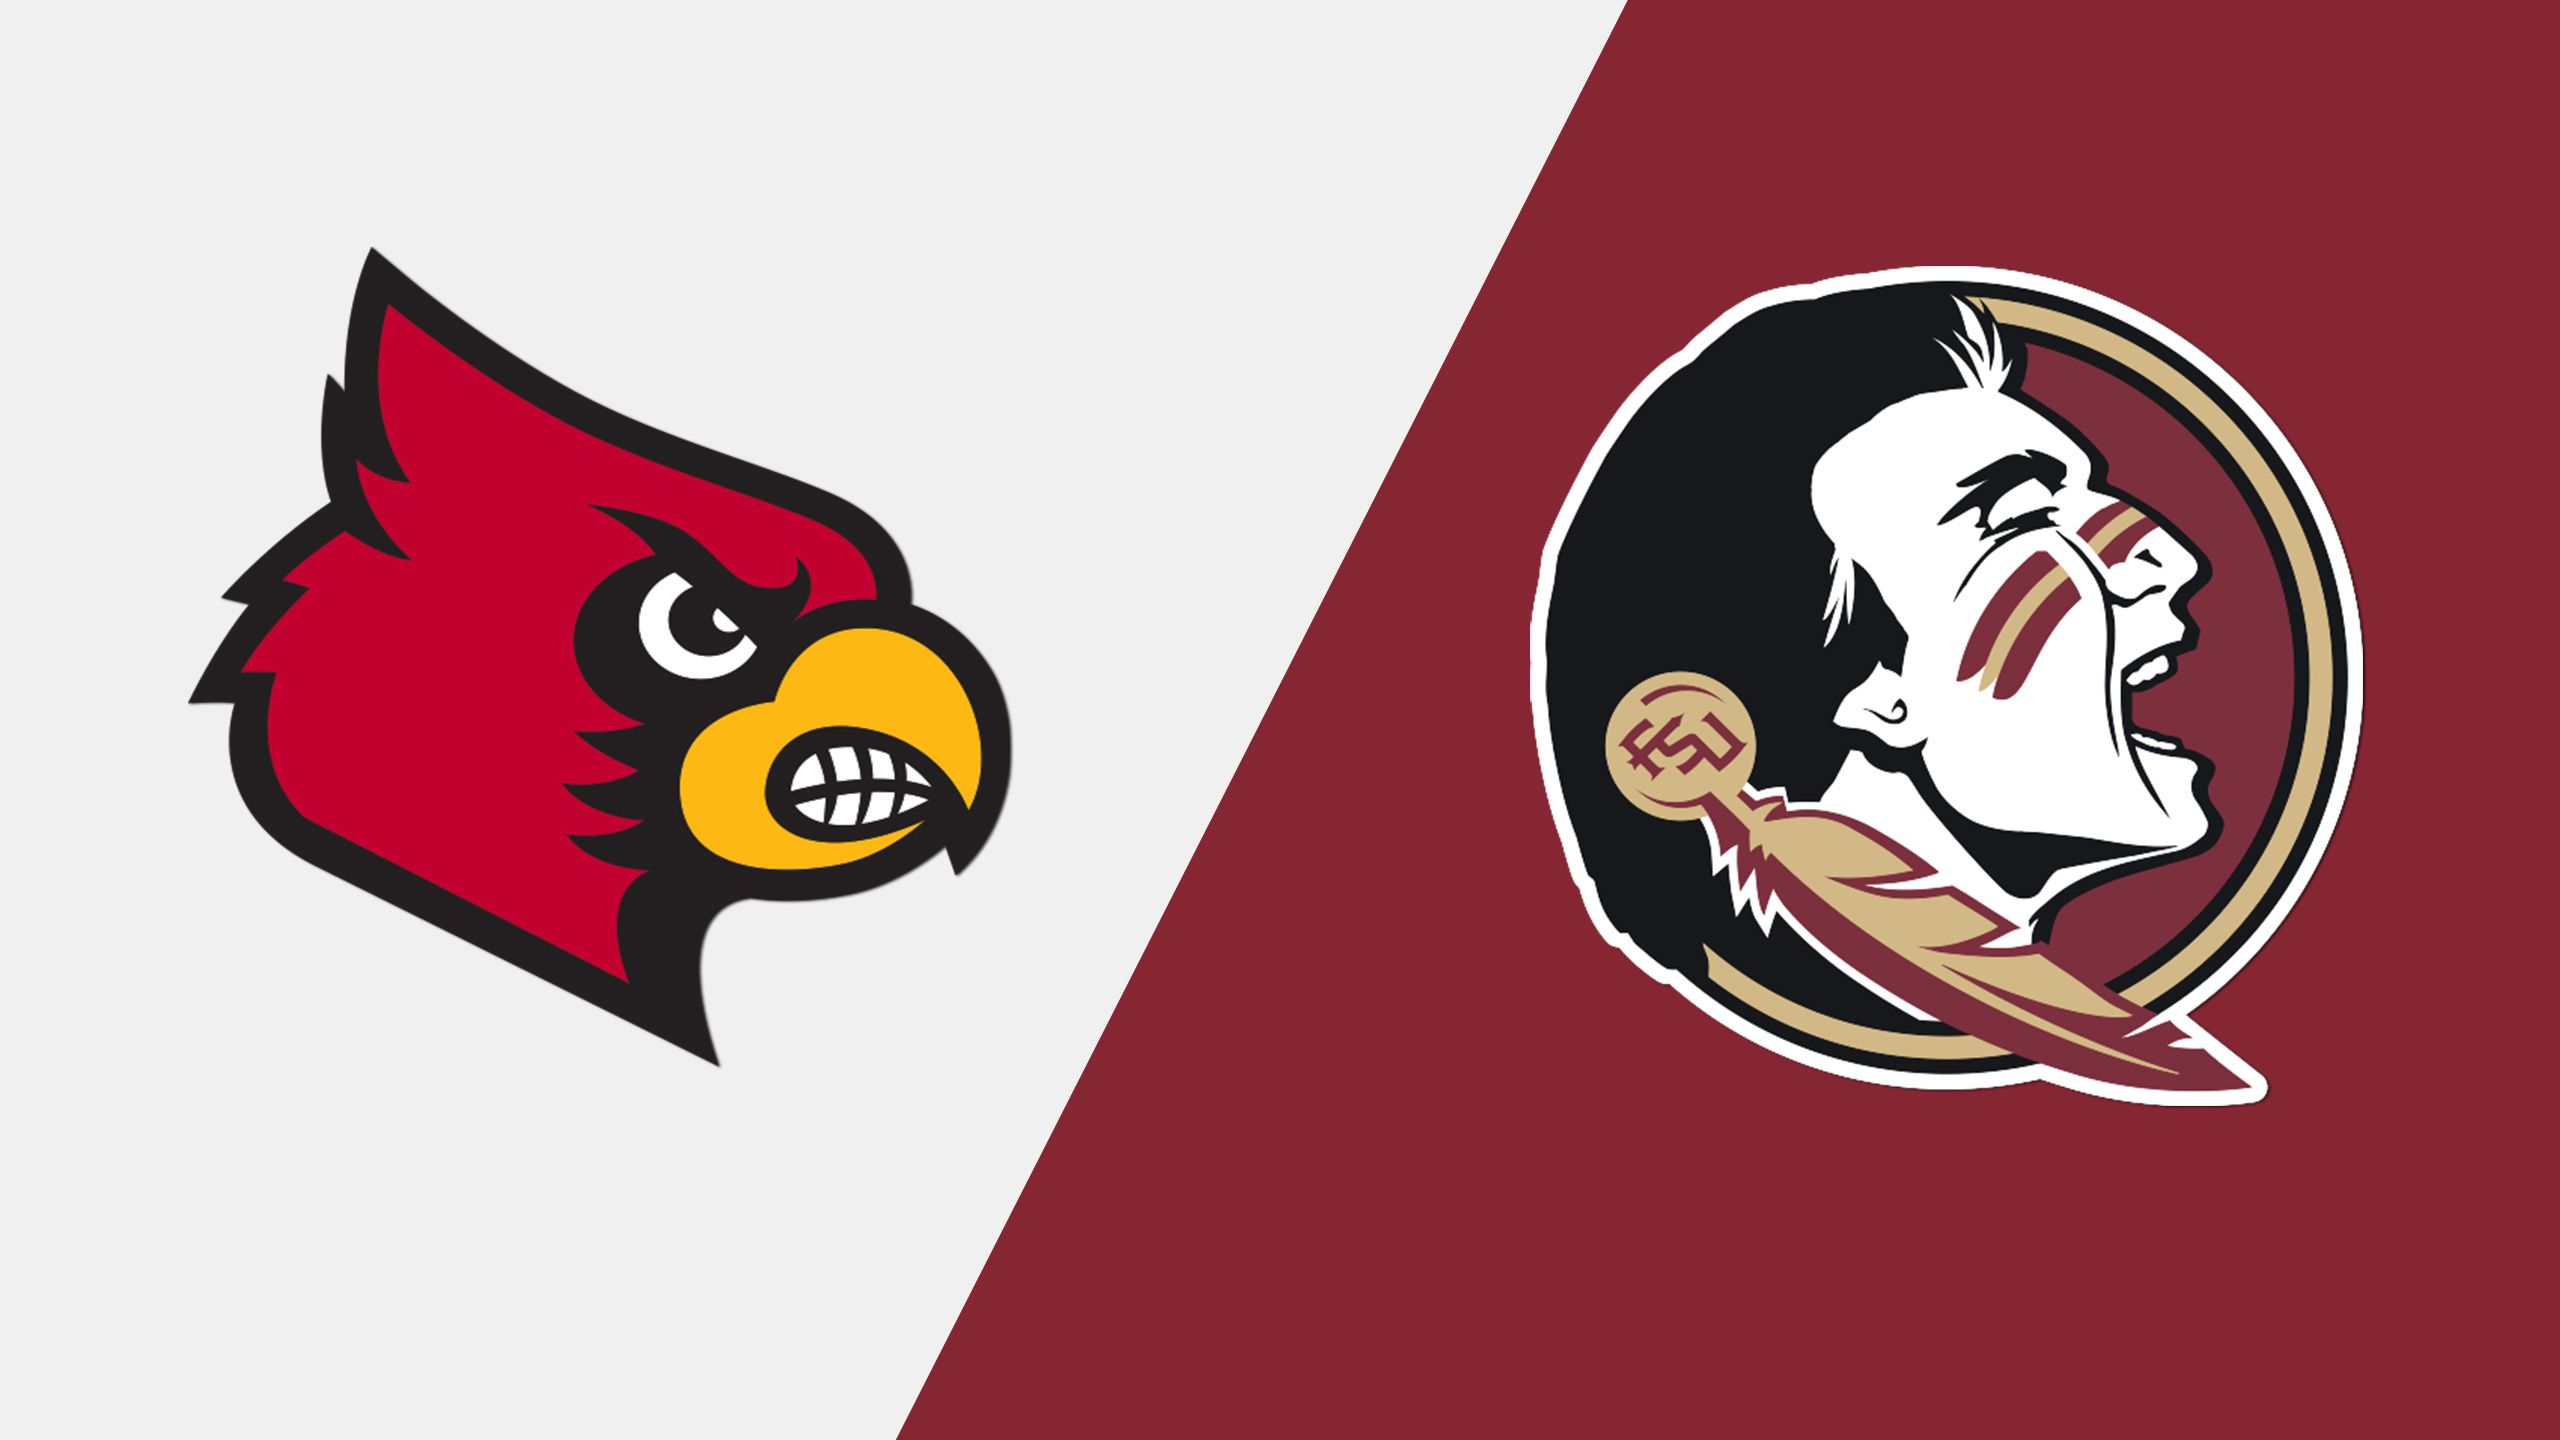 #18 Louisville vs. #5 Florida State (Baseball)